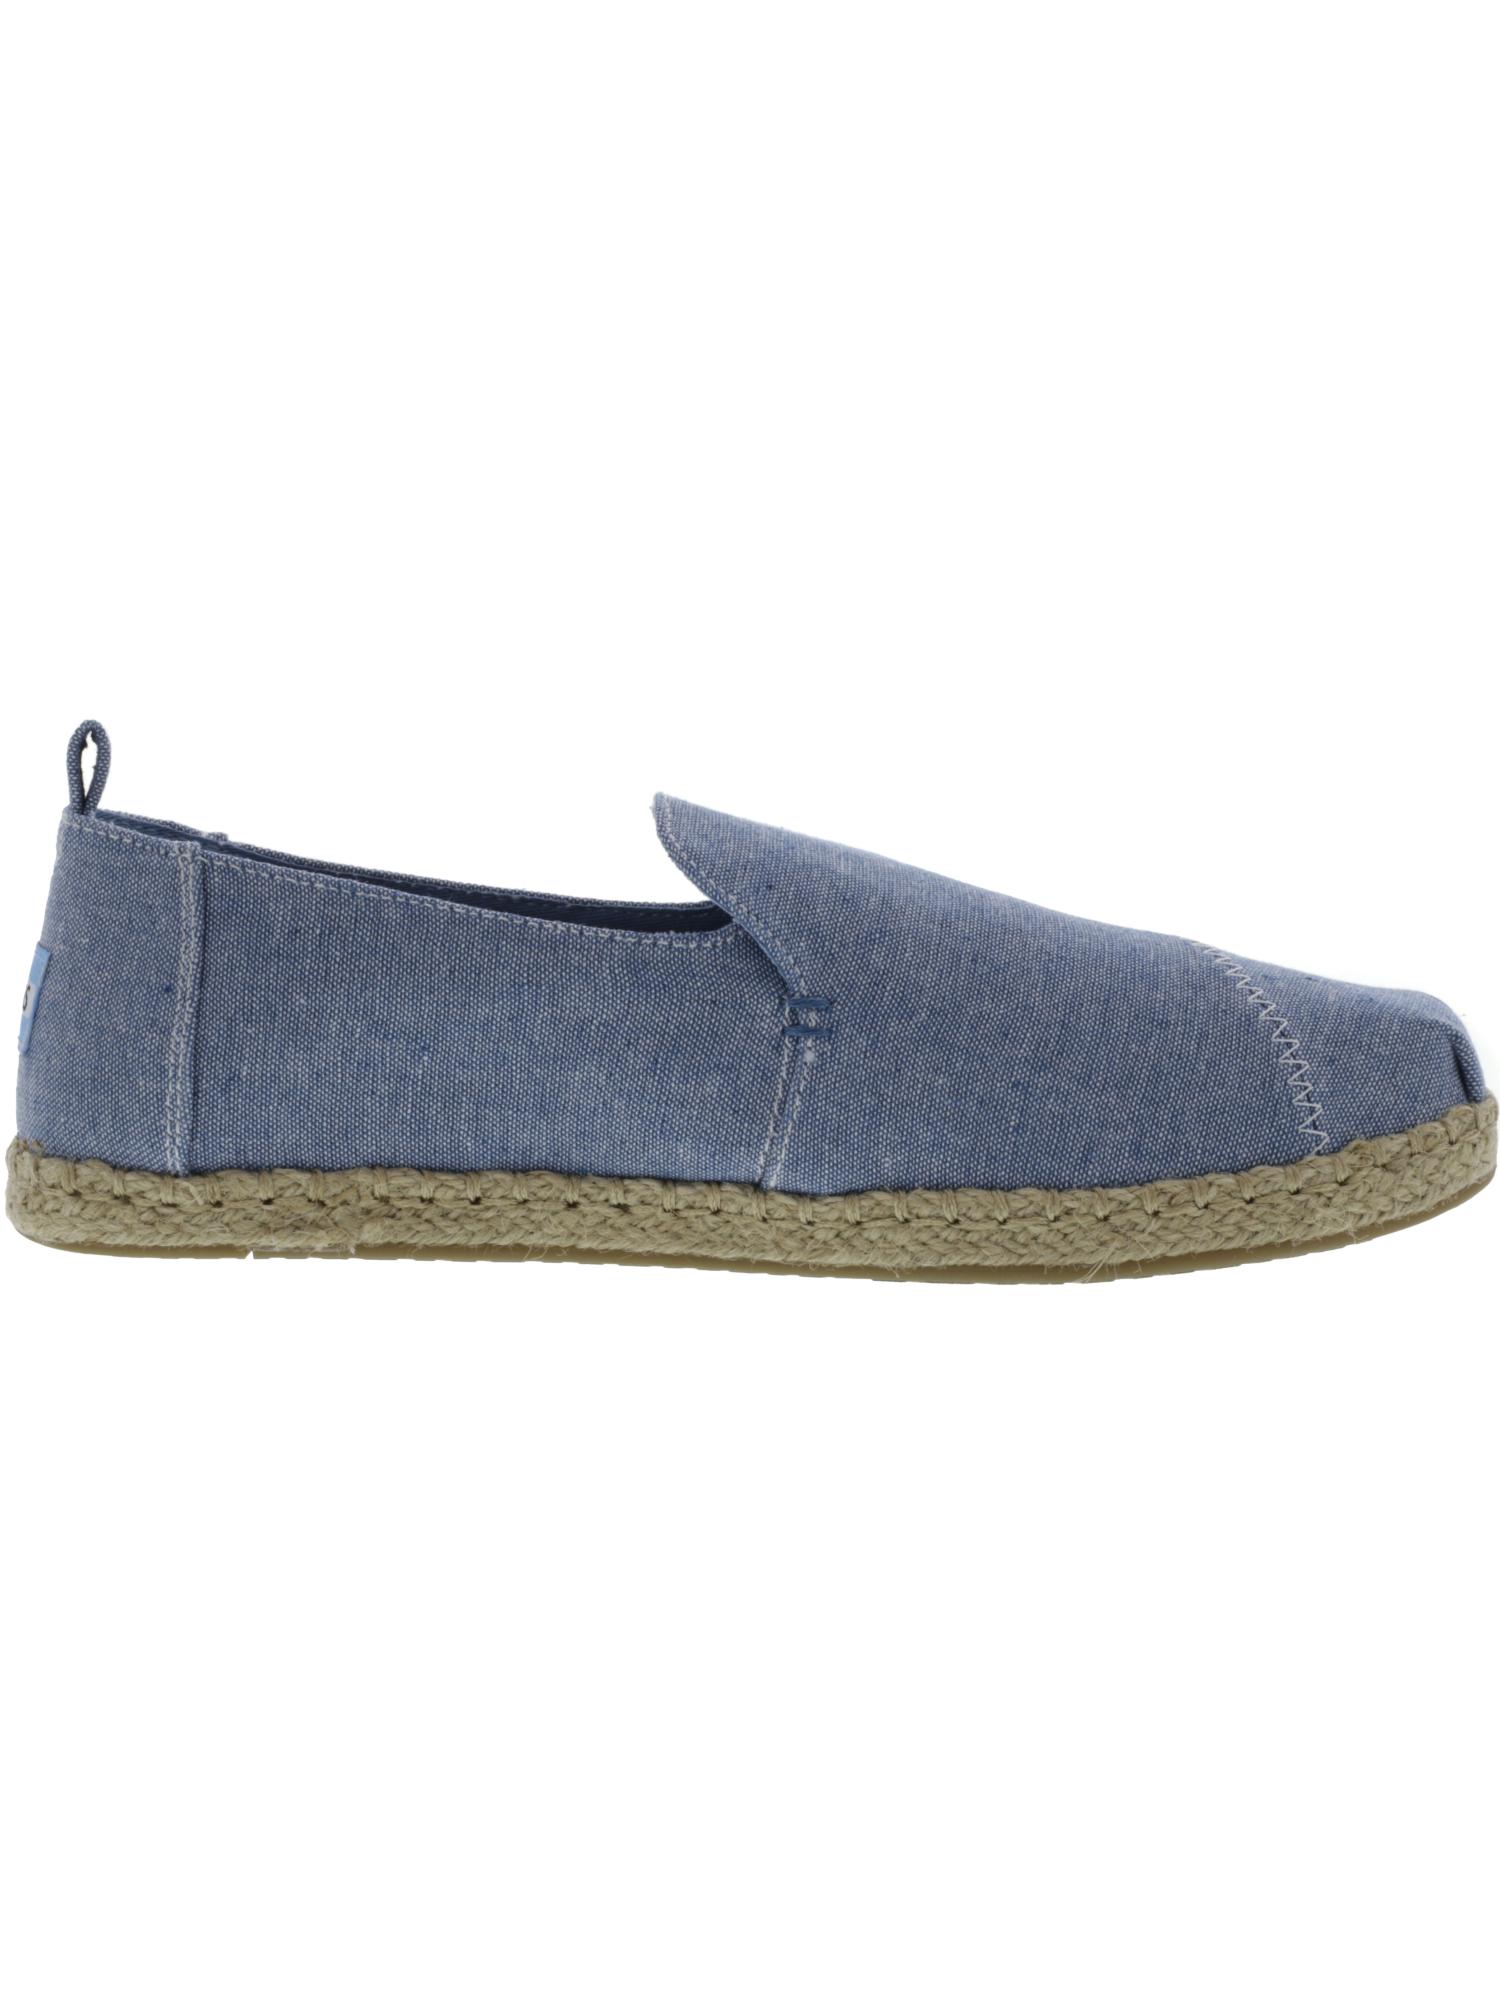 Toms-Women-039-s-Deconstructed-Alpargata-Rope-Slub-Chambray-Canvas-Slip-On-Shoes thumbnail 5